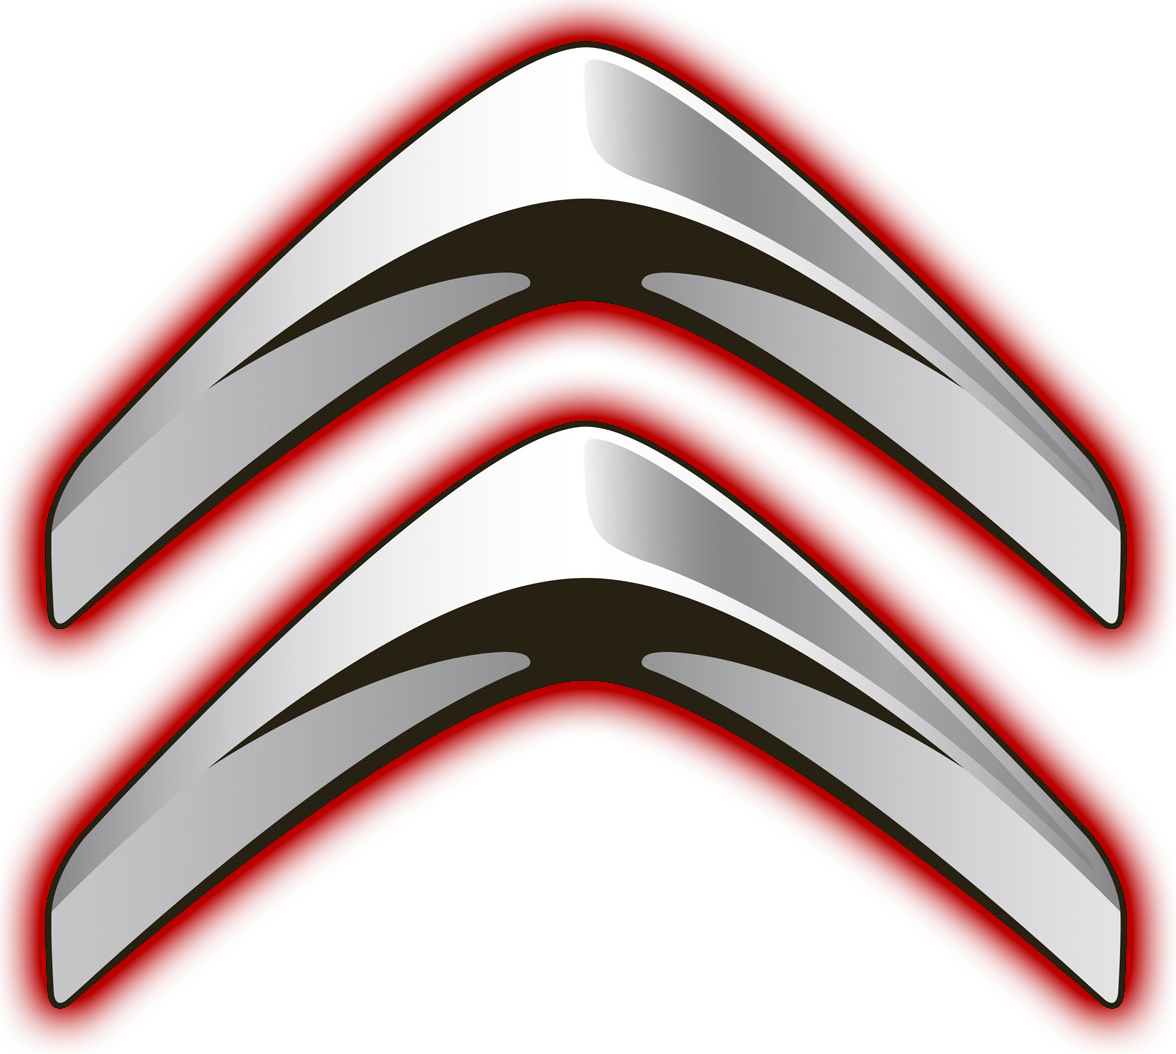 Citroen Logo Citroen Car Symbol Meaning And History Car Brand